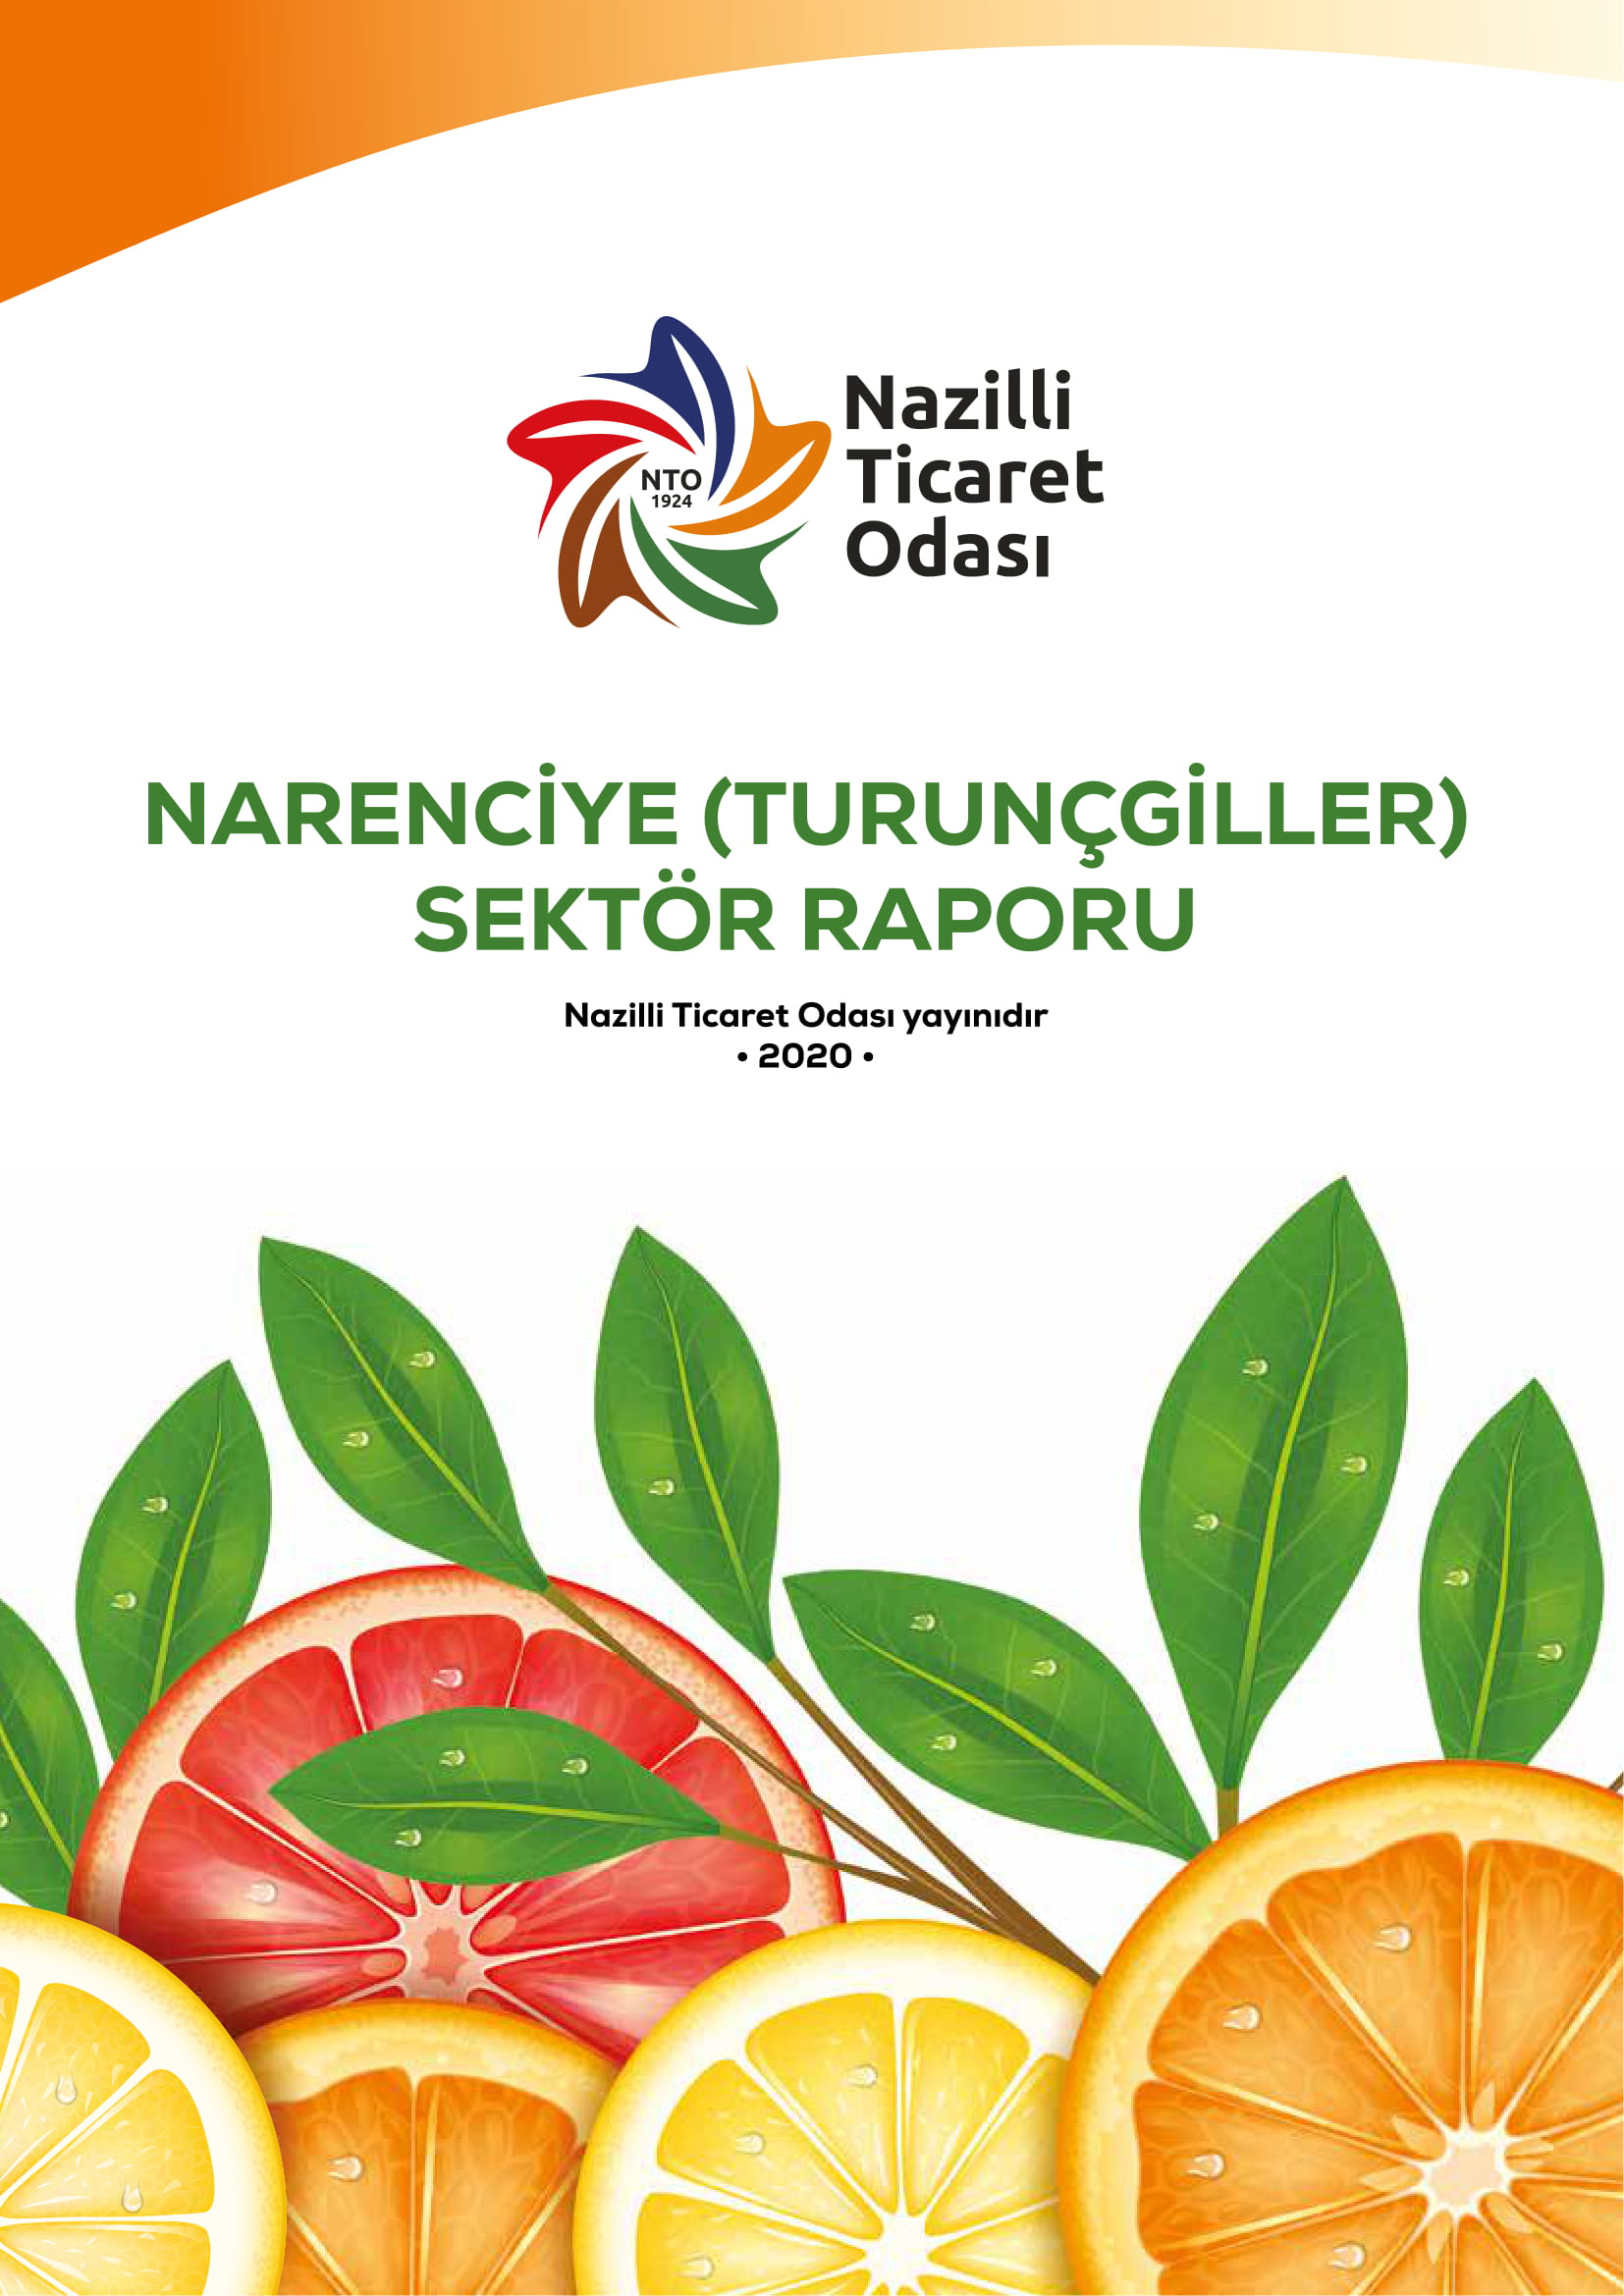 narenciye-sektor-raporu-01